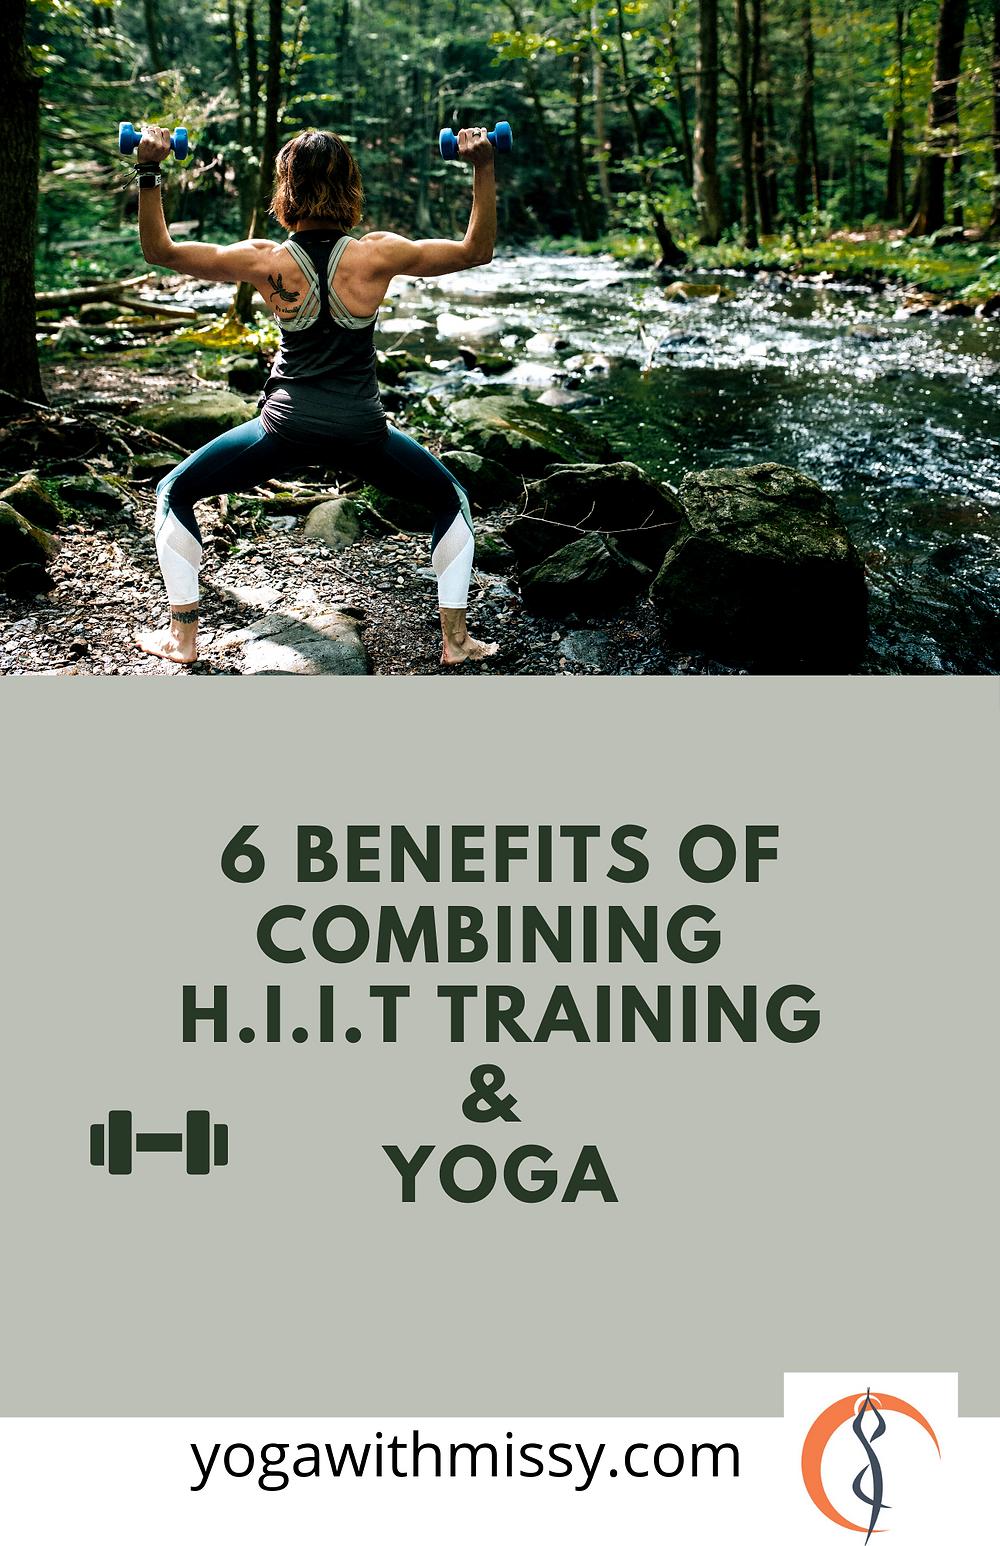 HIIT Training and Yoga Benefits